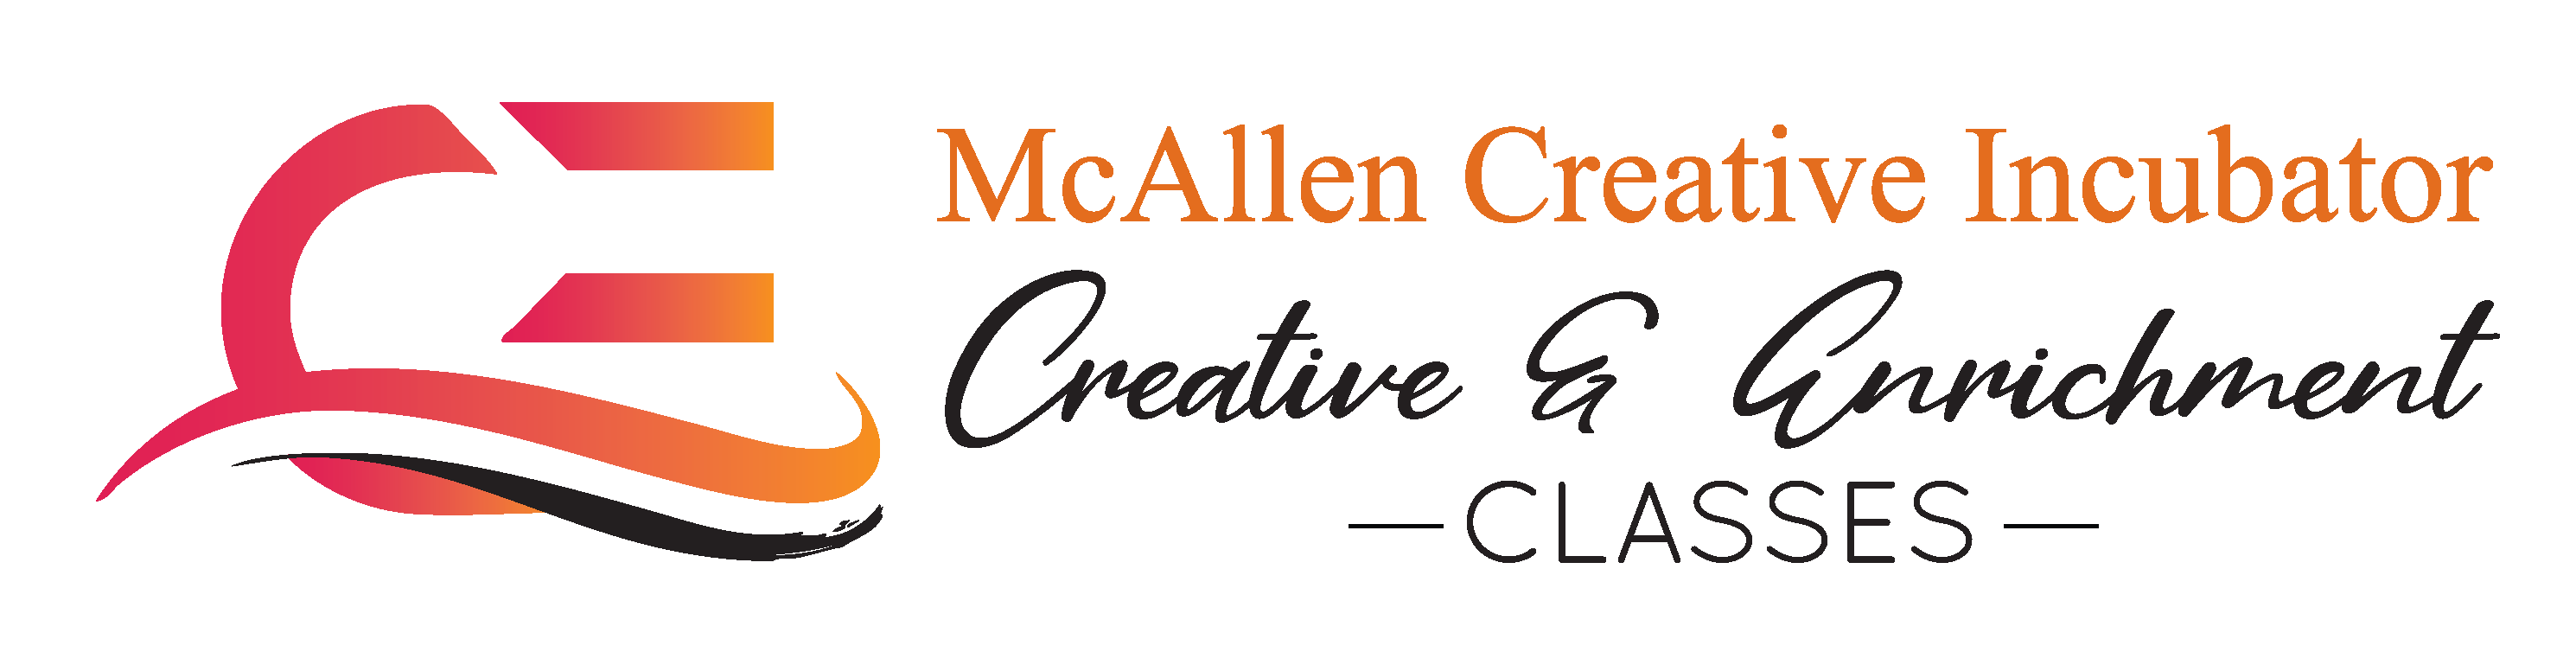 McAllen Learning